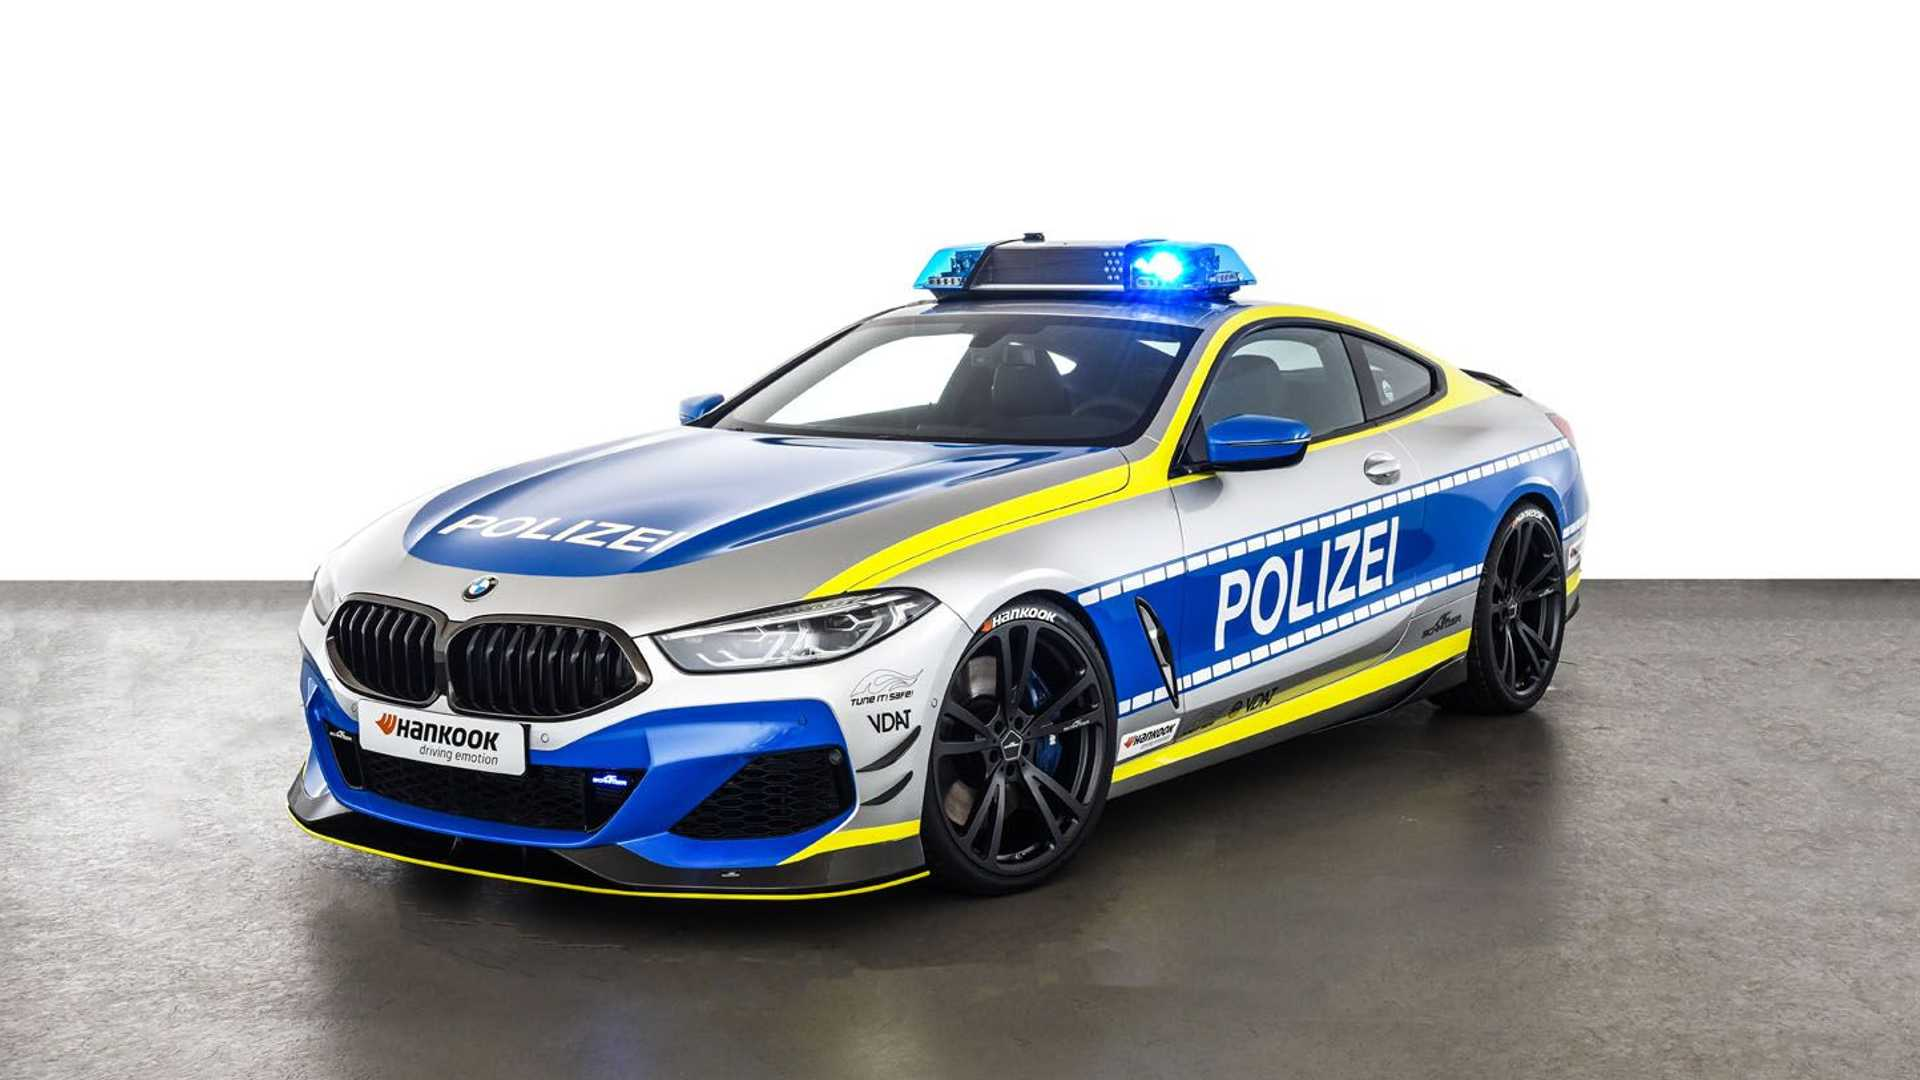 BMW-M850i-police-car-tune-it-safe-10